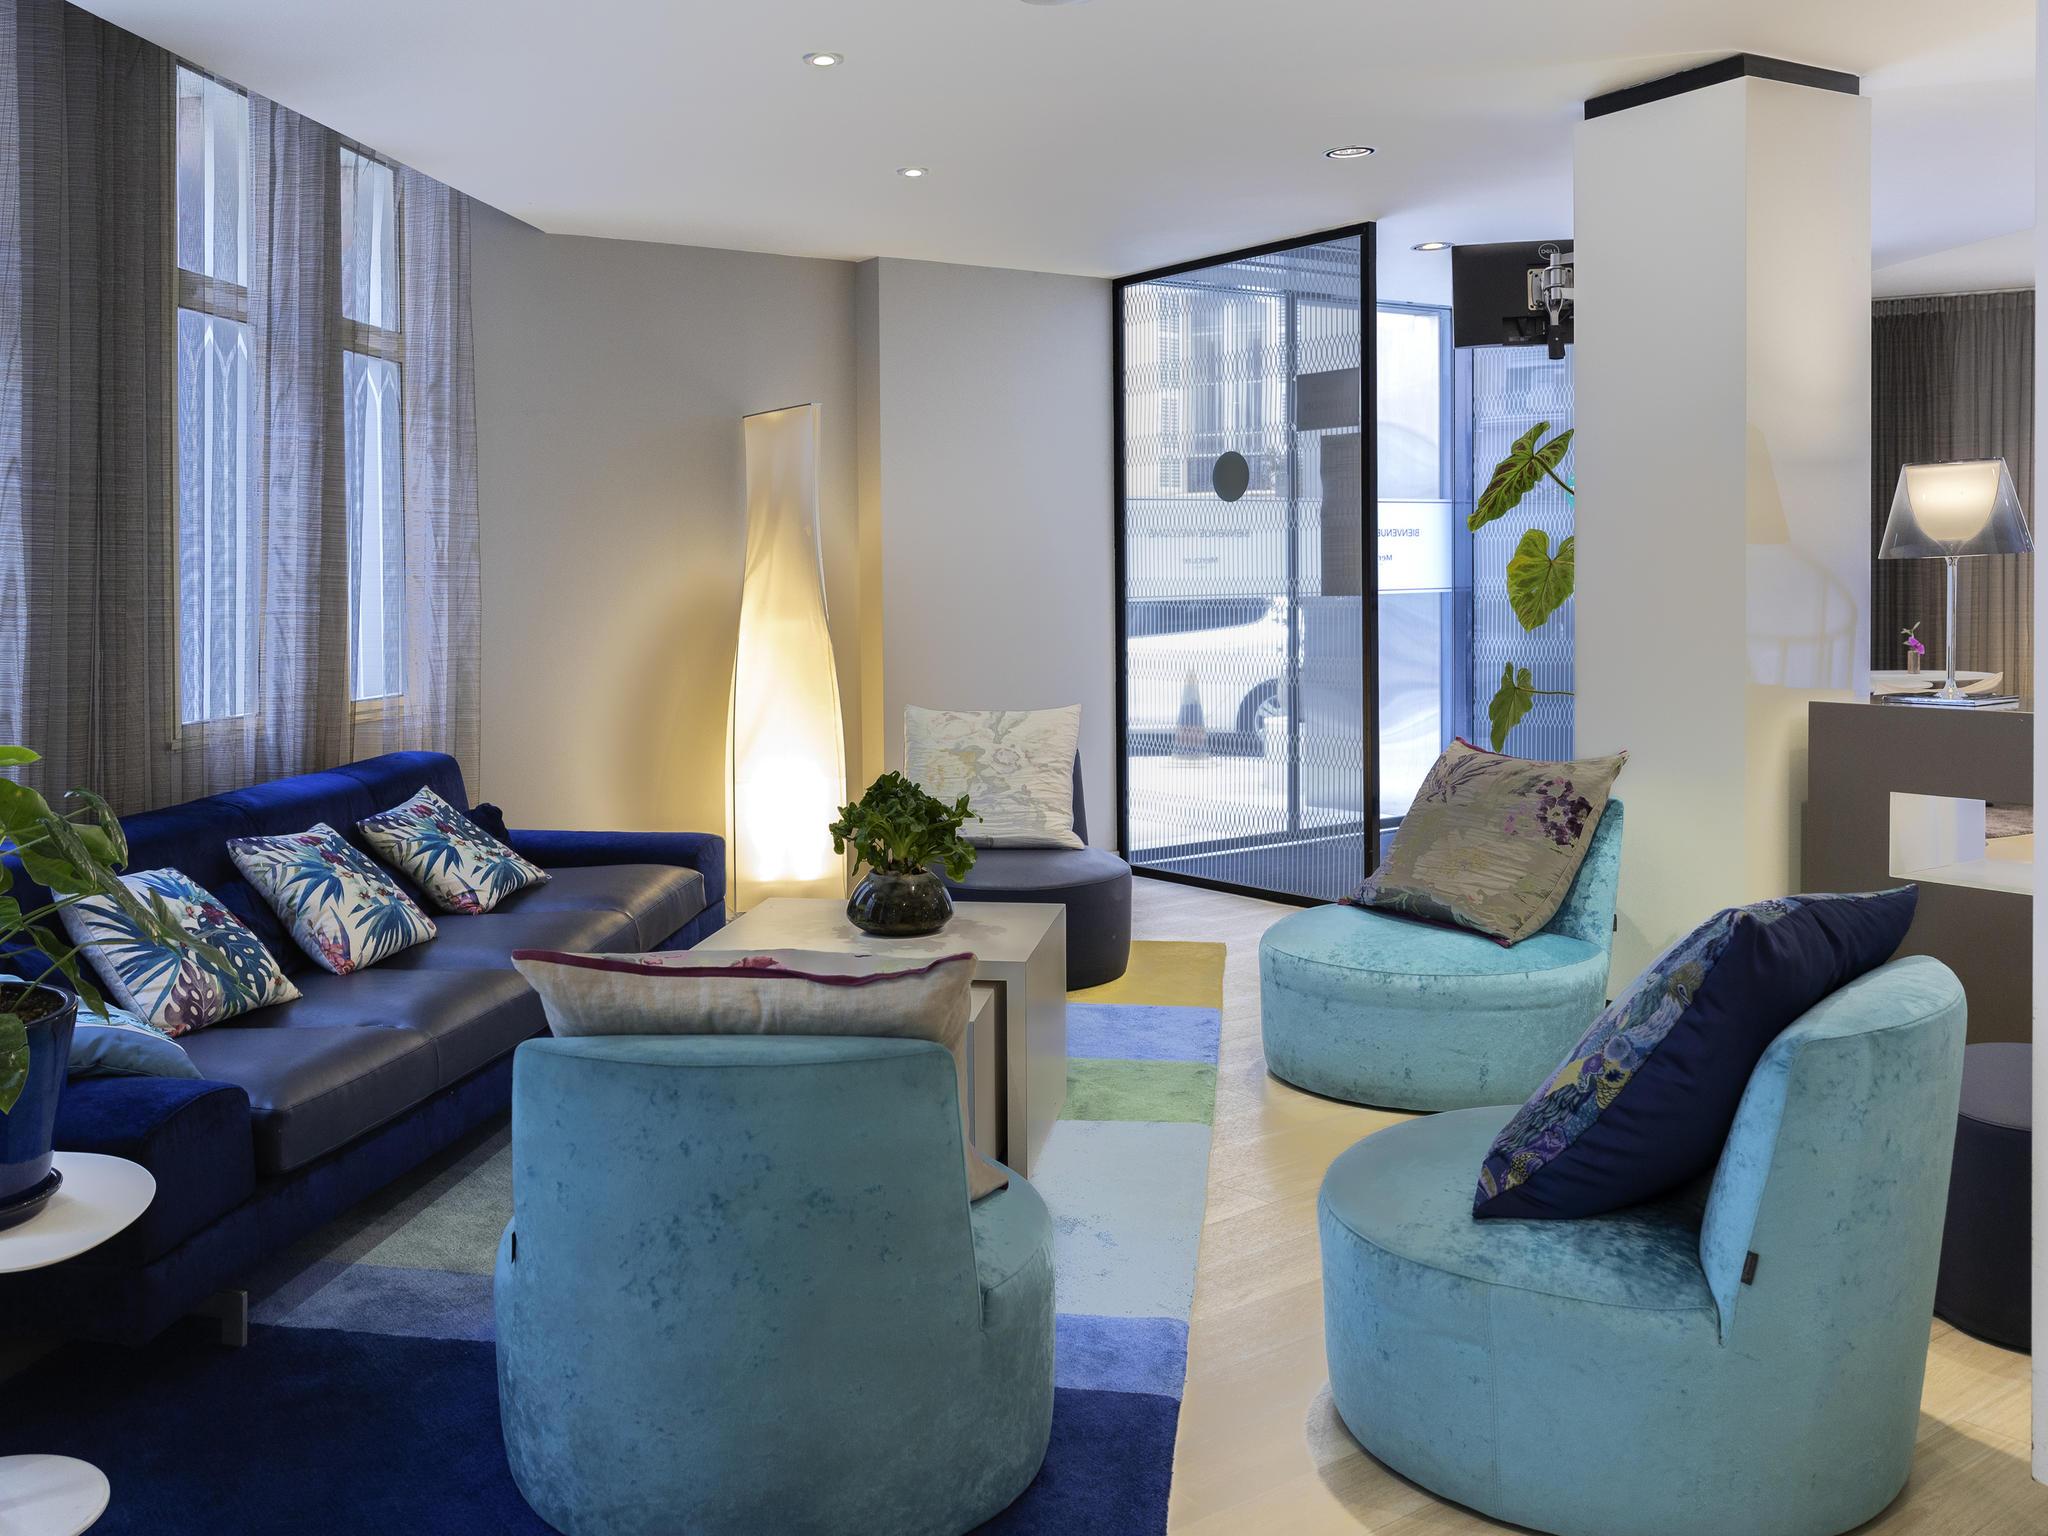 Hotel – Hotel Mercure Nice Centro Grimaldi